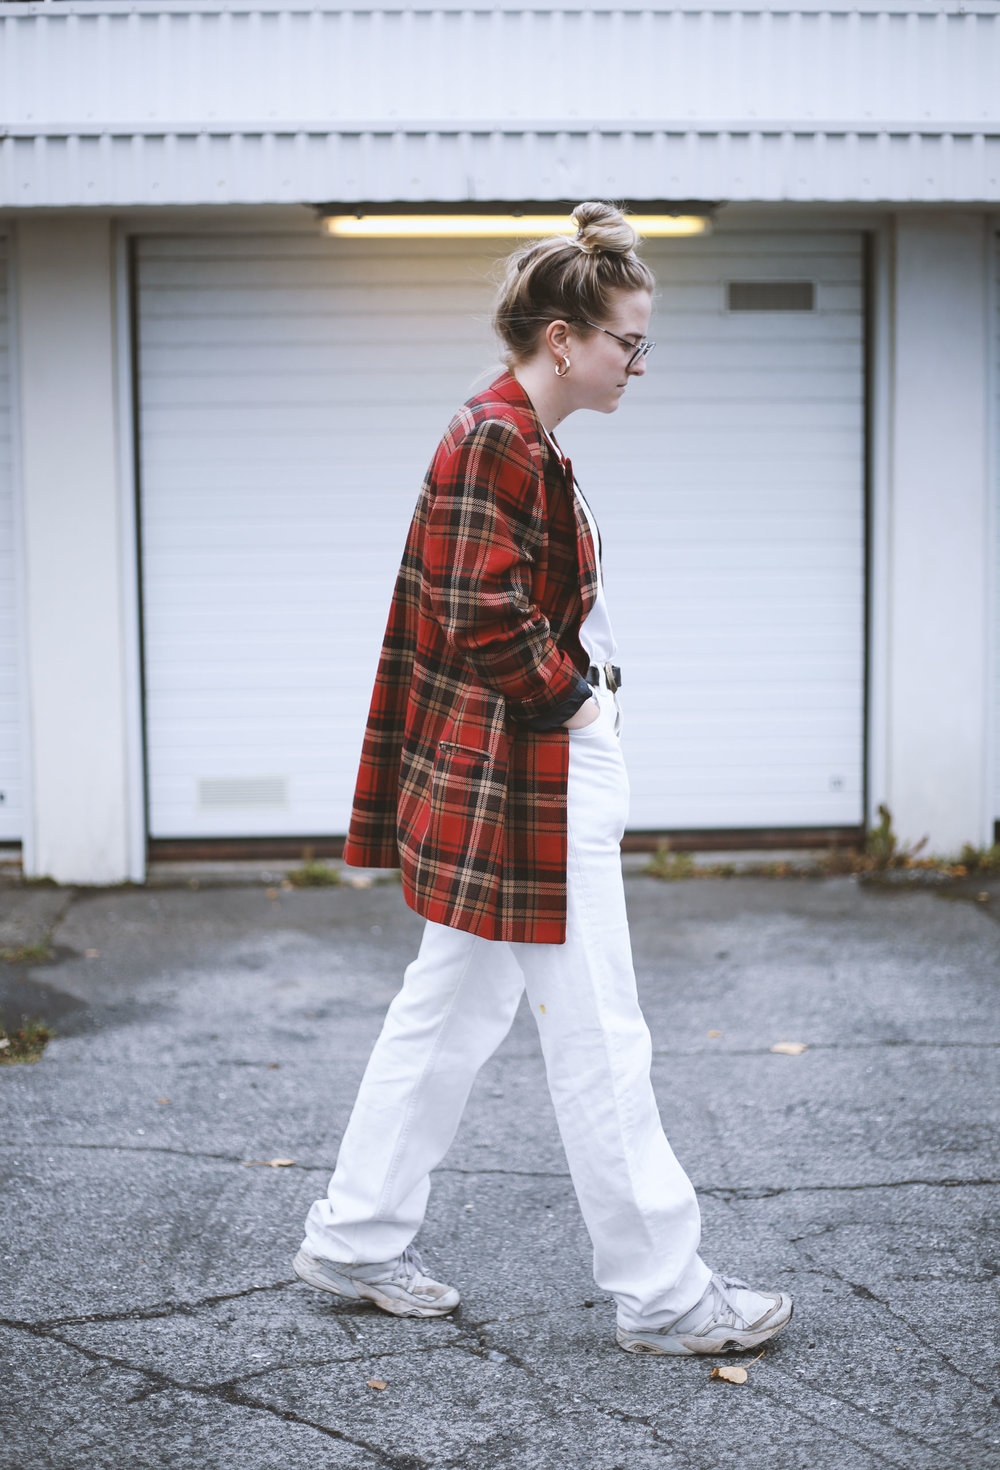 thestreetland_bryndis_thorsteinsdottir_ourcityscape_reykjavik_iceland_photography_streetstyle_fashion.jpg